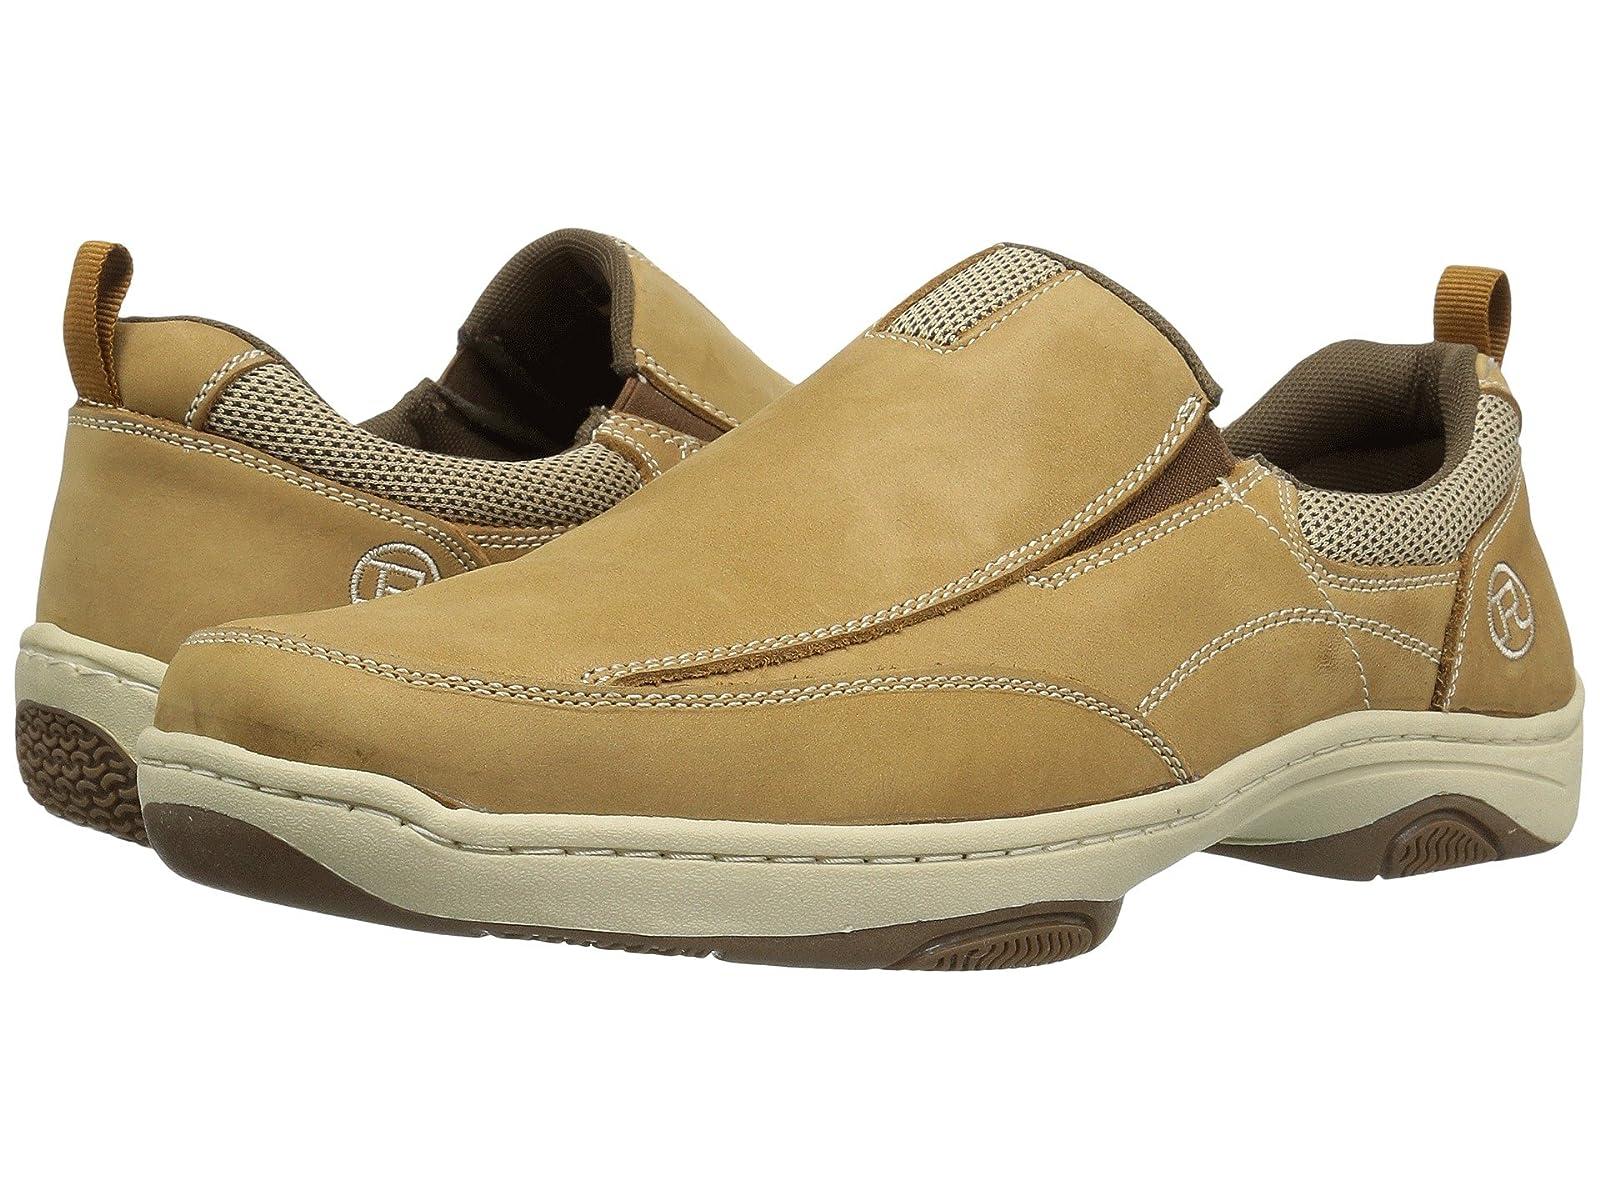 Roper Skipper TooCheap and distinctive eye-catching shoes